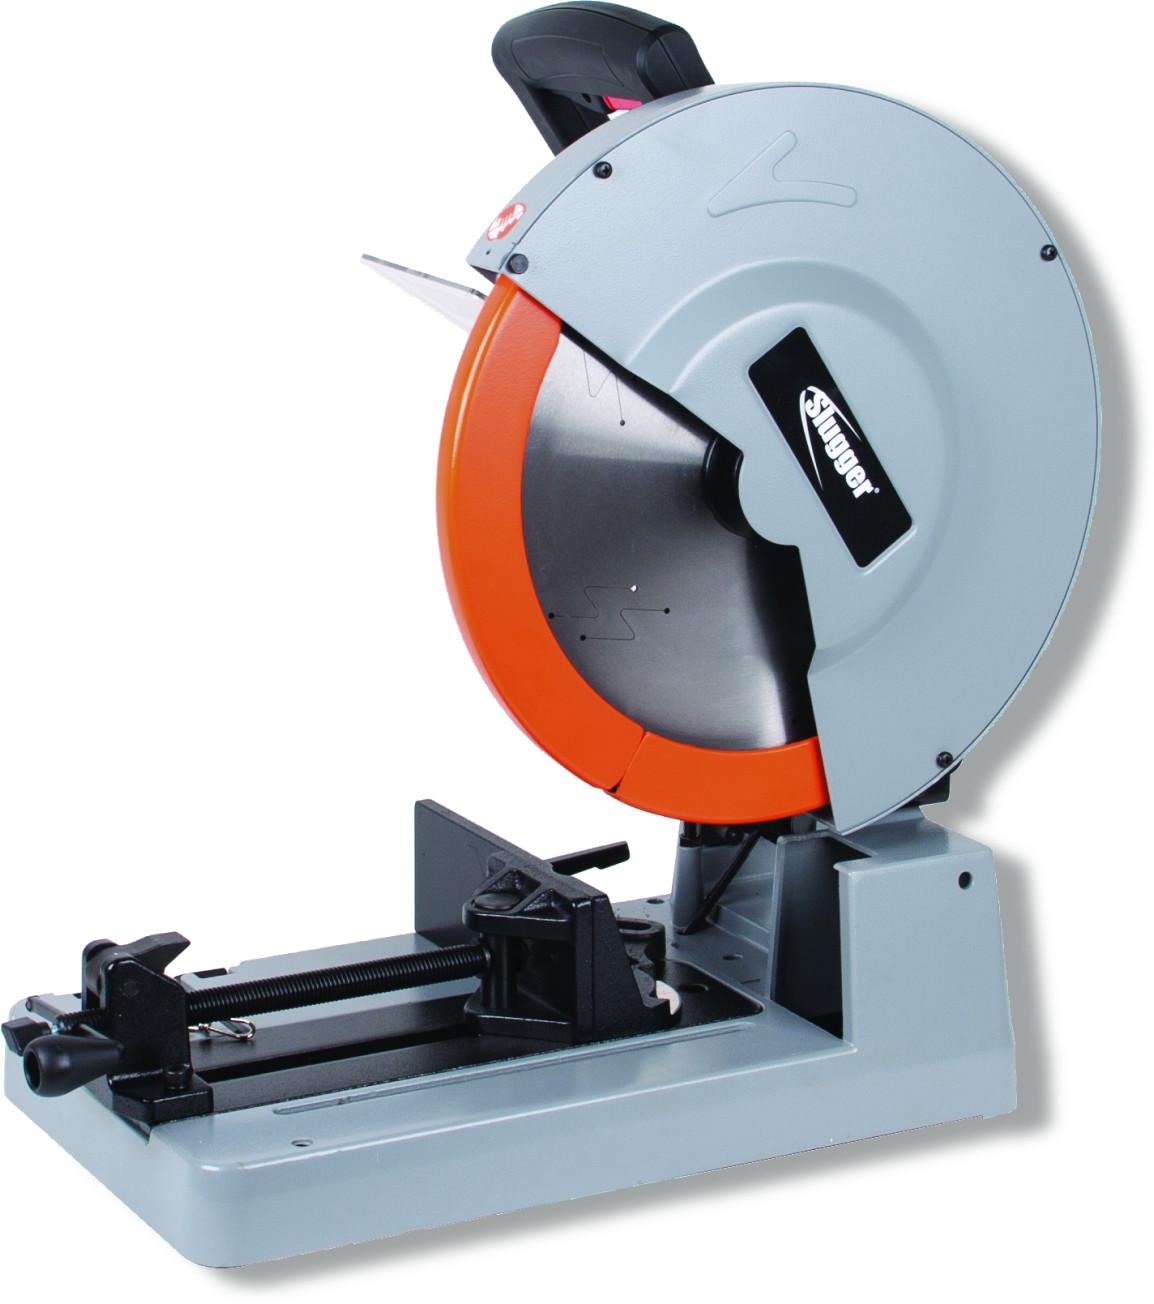 Metal Cutting Saws 14 In Slugger Metal Cutting Saw Fein